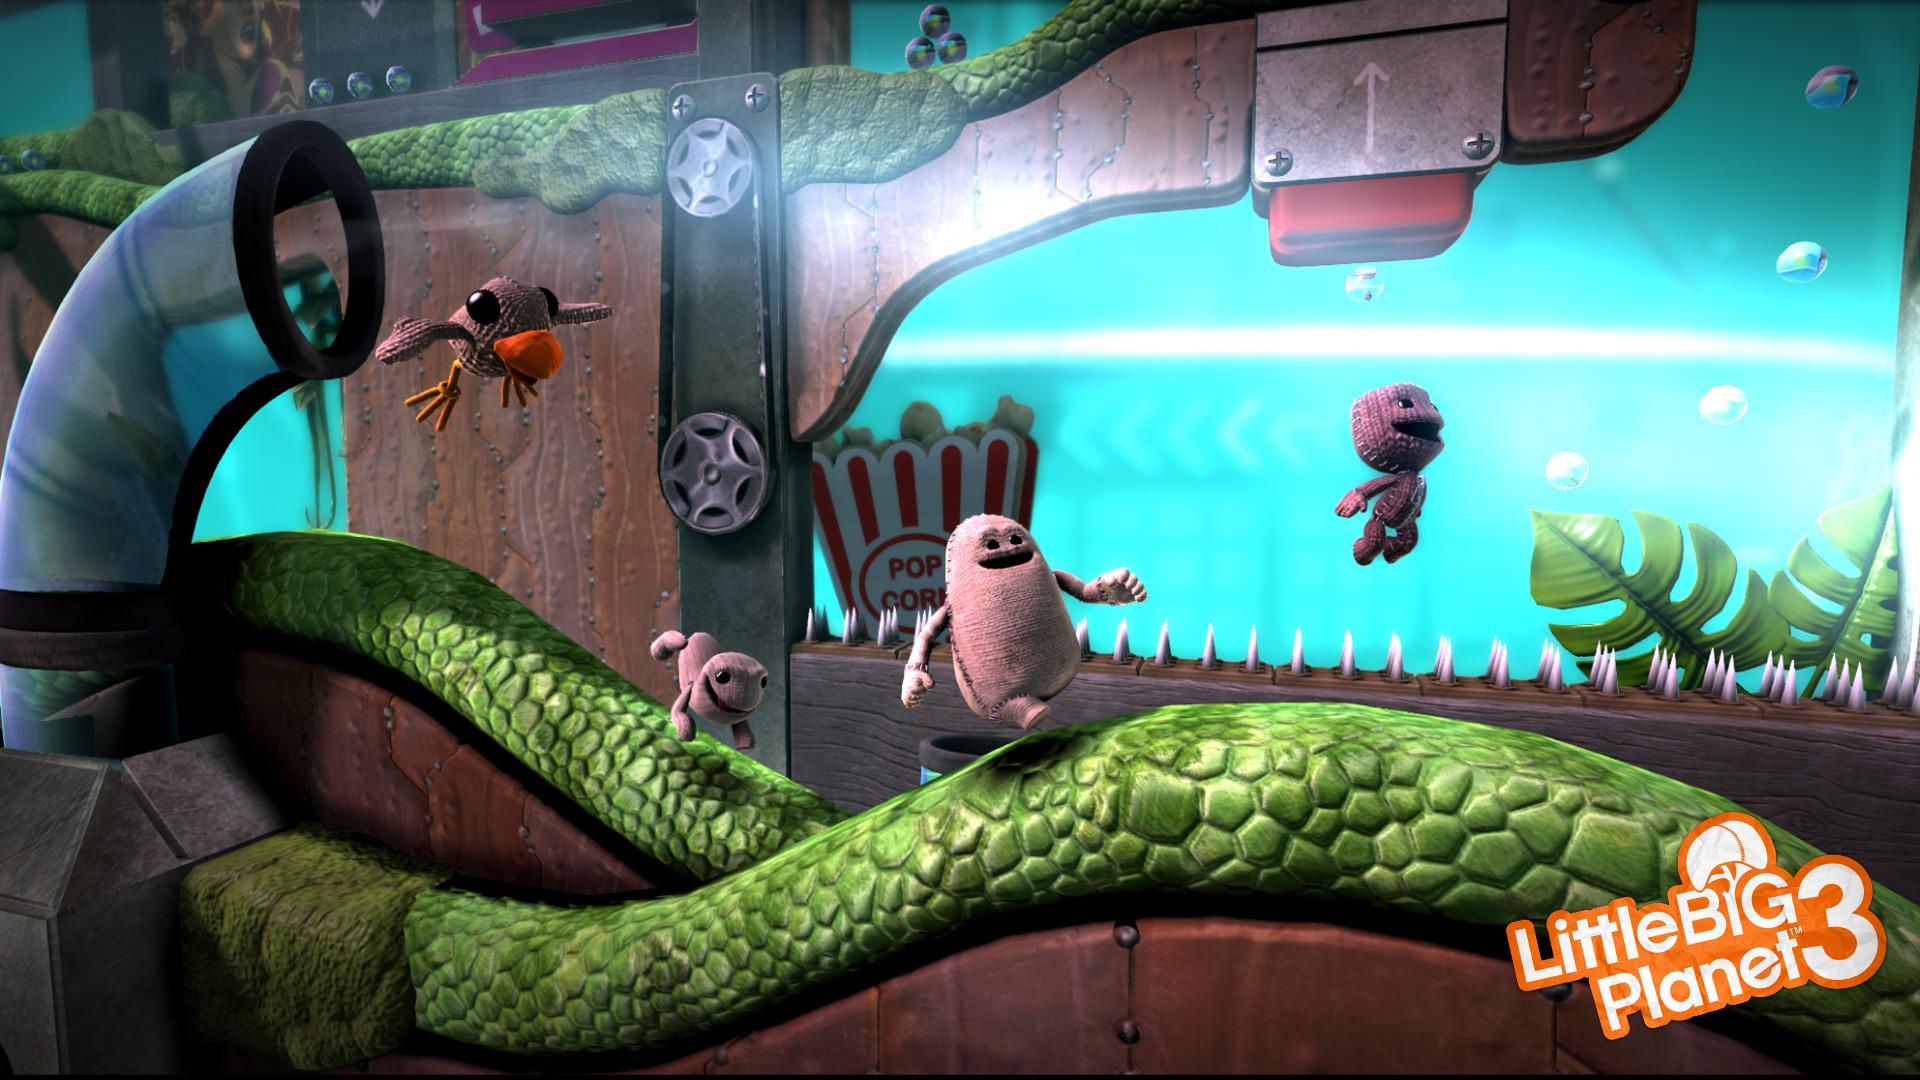 LittleBigPlanet3 PS4 Editeur 007